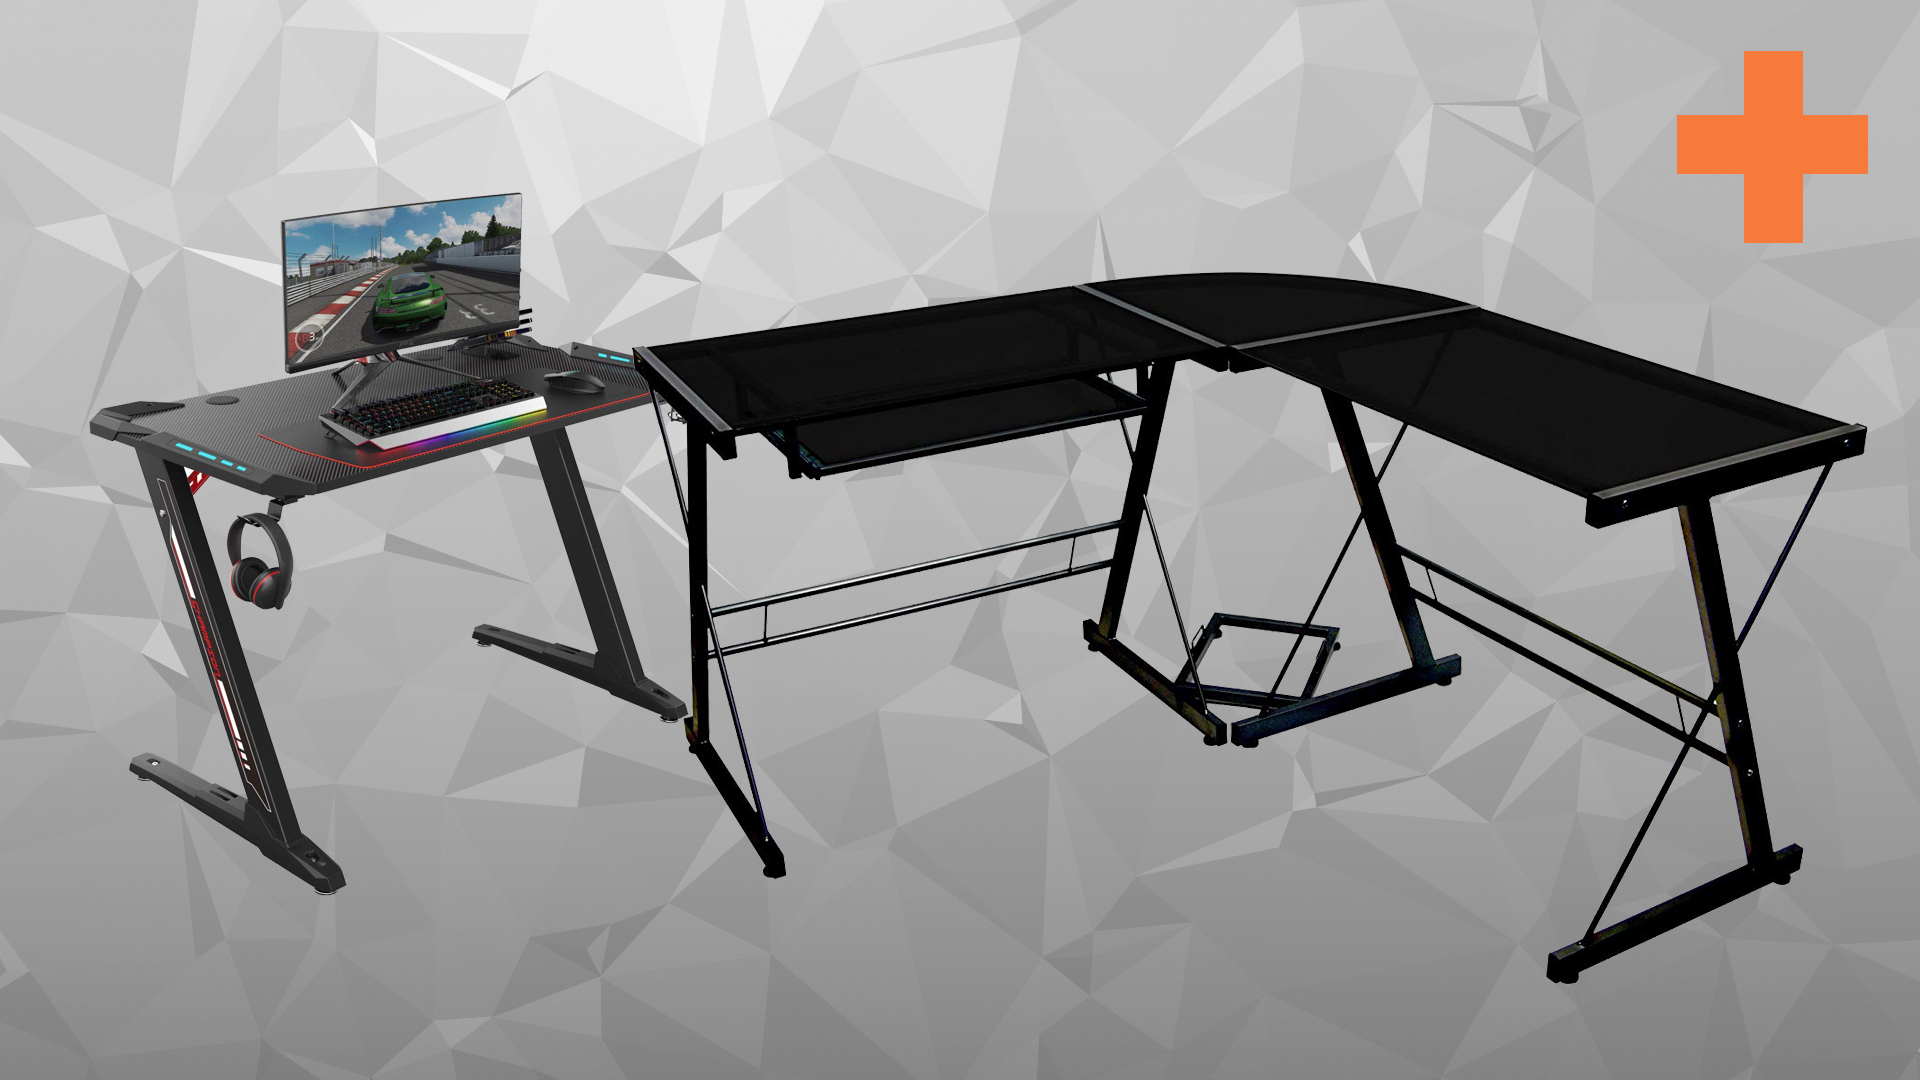 The best gaming desks for 2020 | GamesRadar+